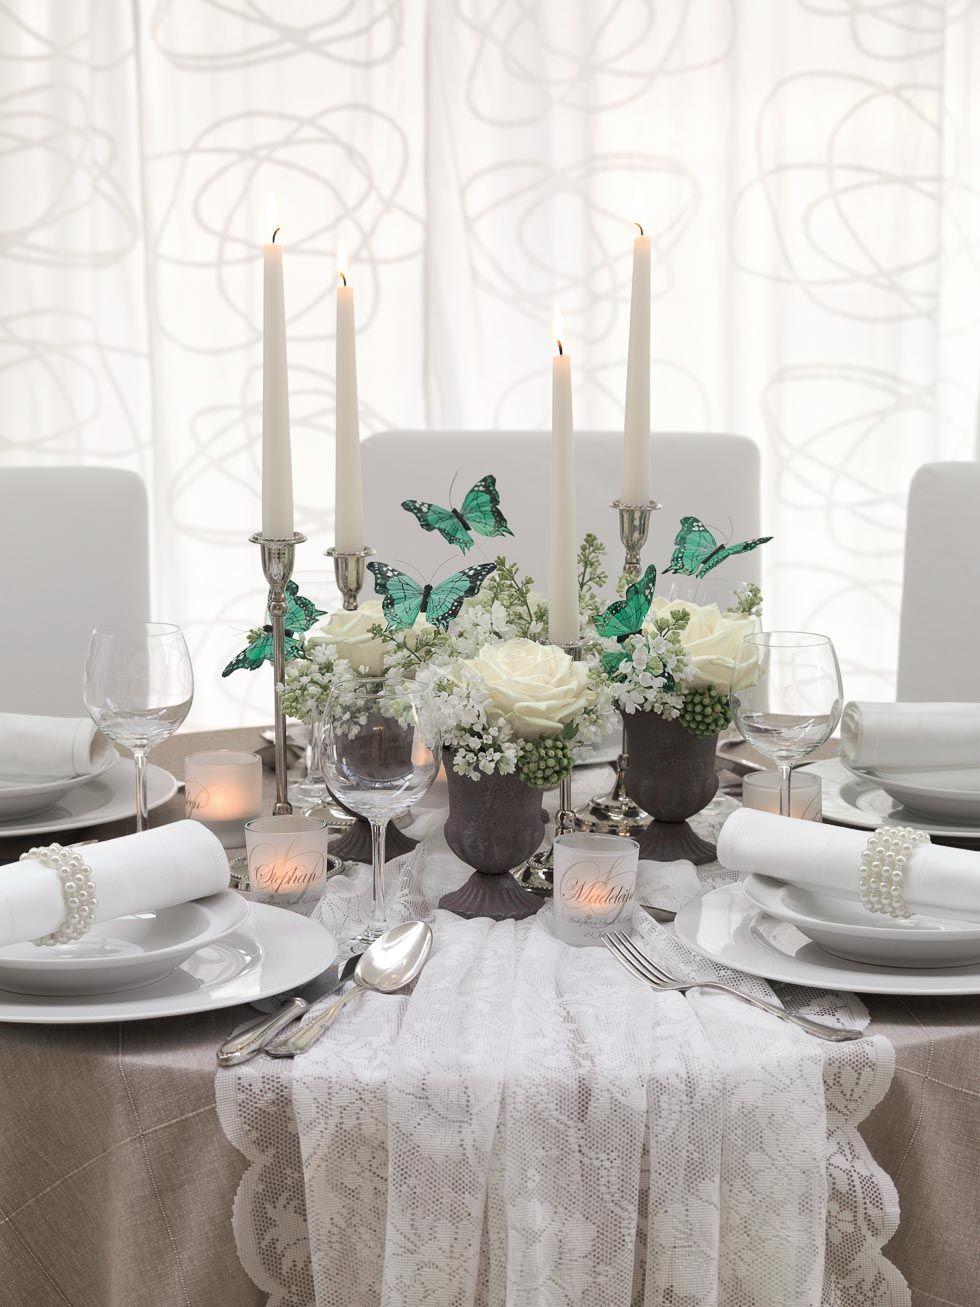 Hochzeitskonzept downton abbey vintage tischdekorationen for Tischdekoration vintage